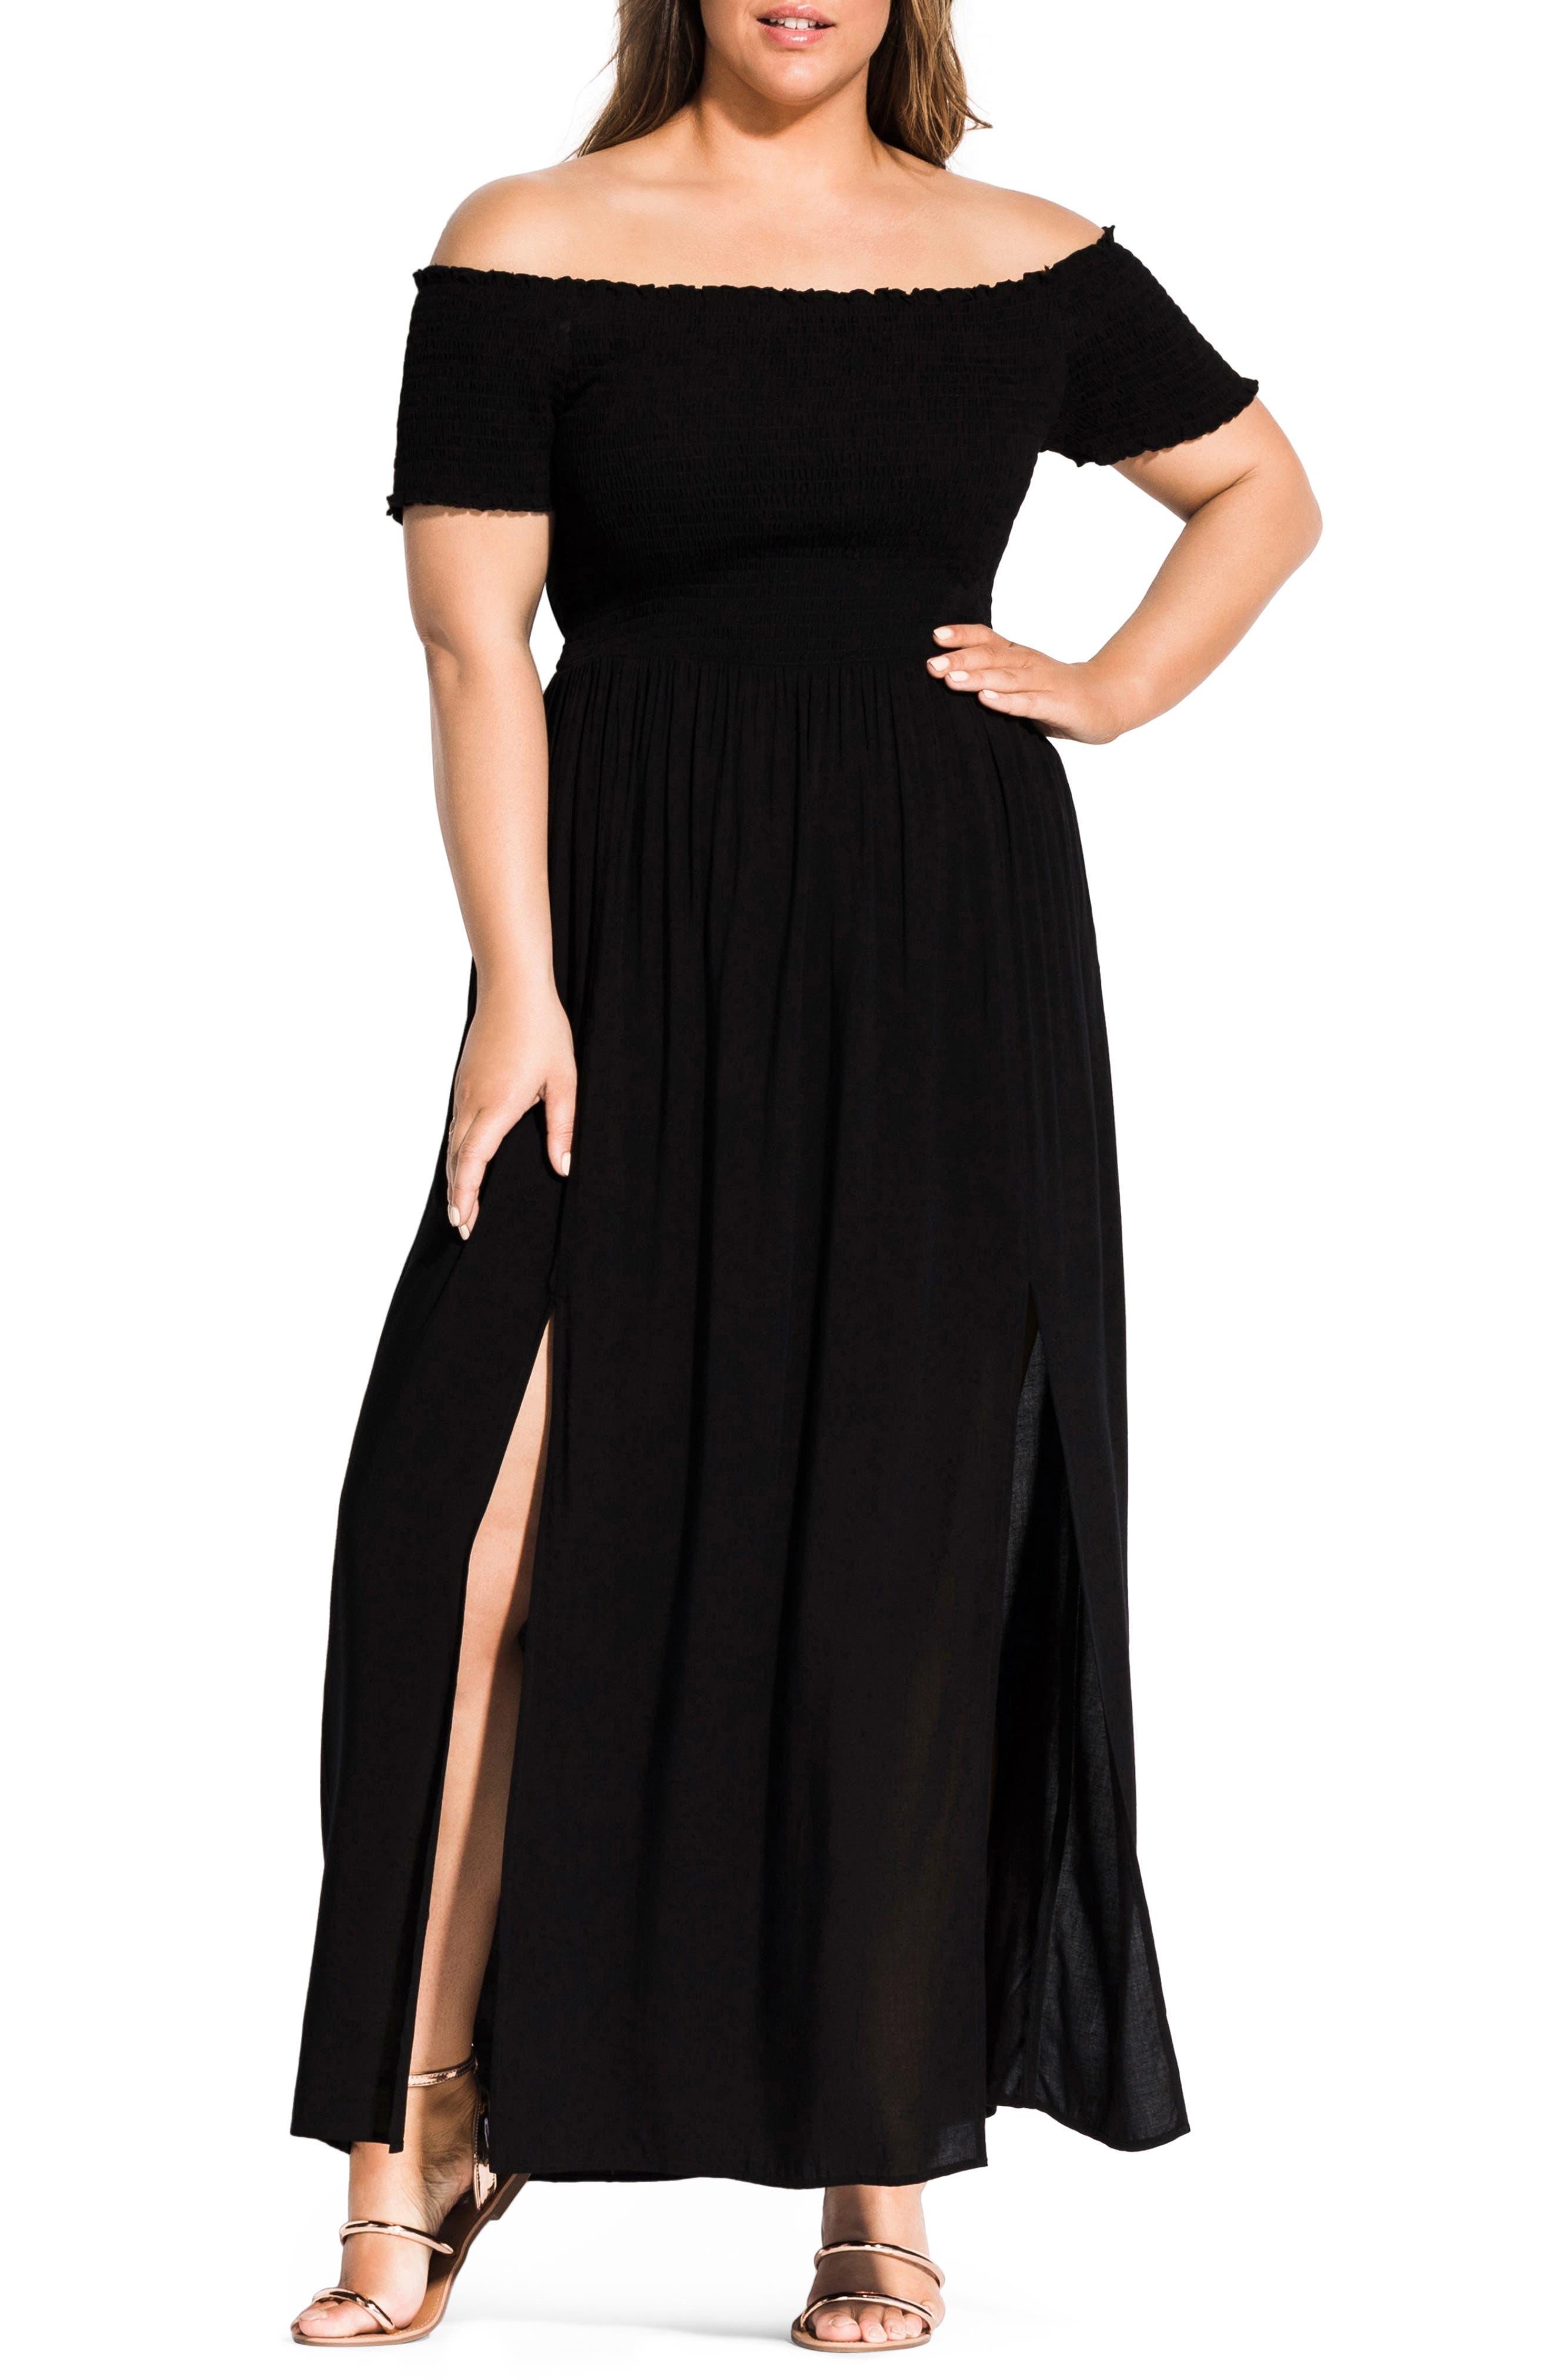 Plus Size City Chic Summer Passion Off The Shoulder Maxi Sundress, Black